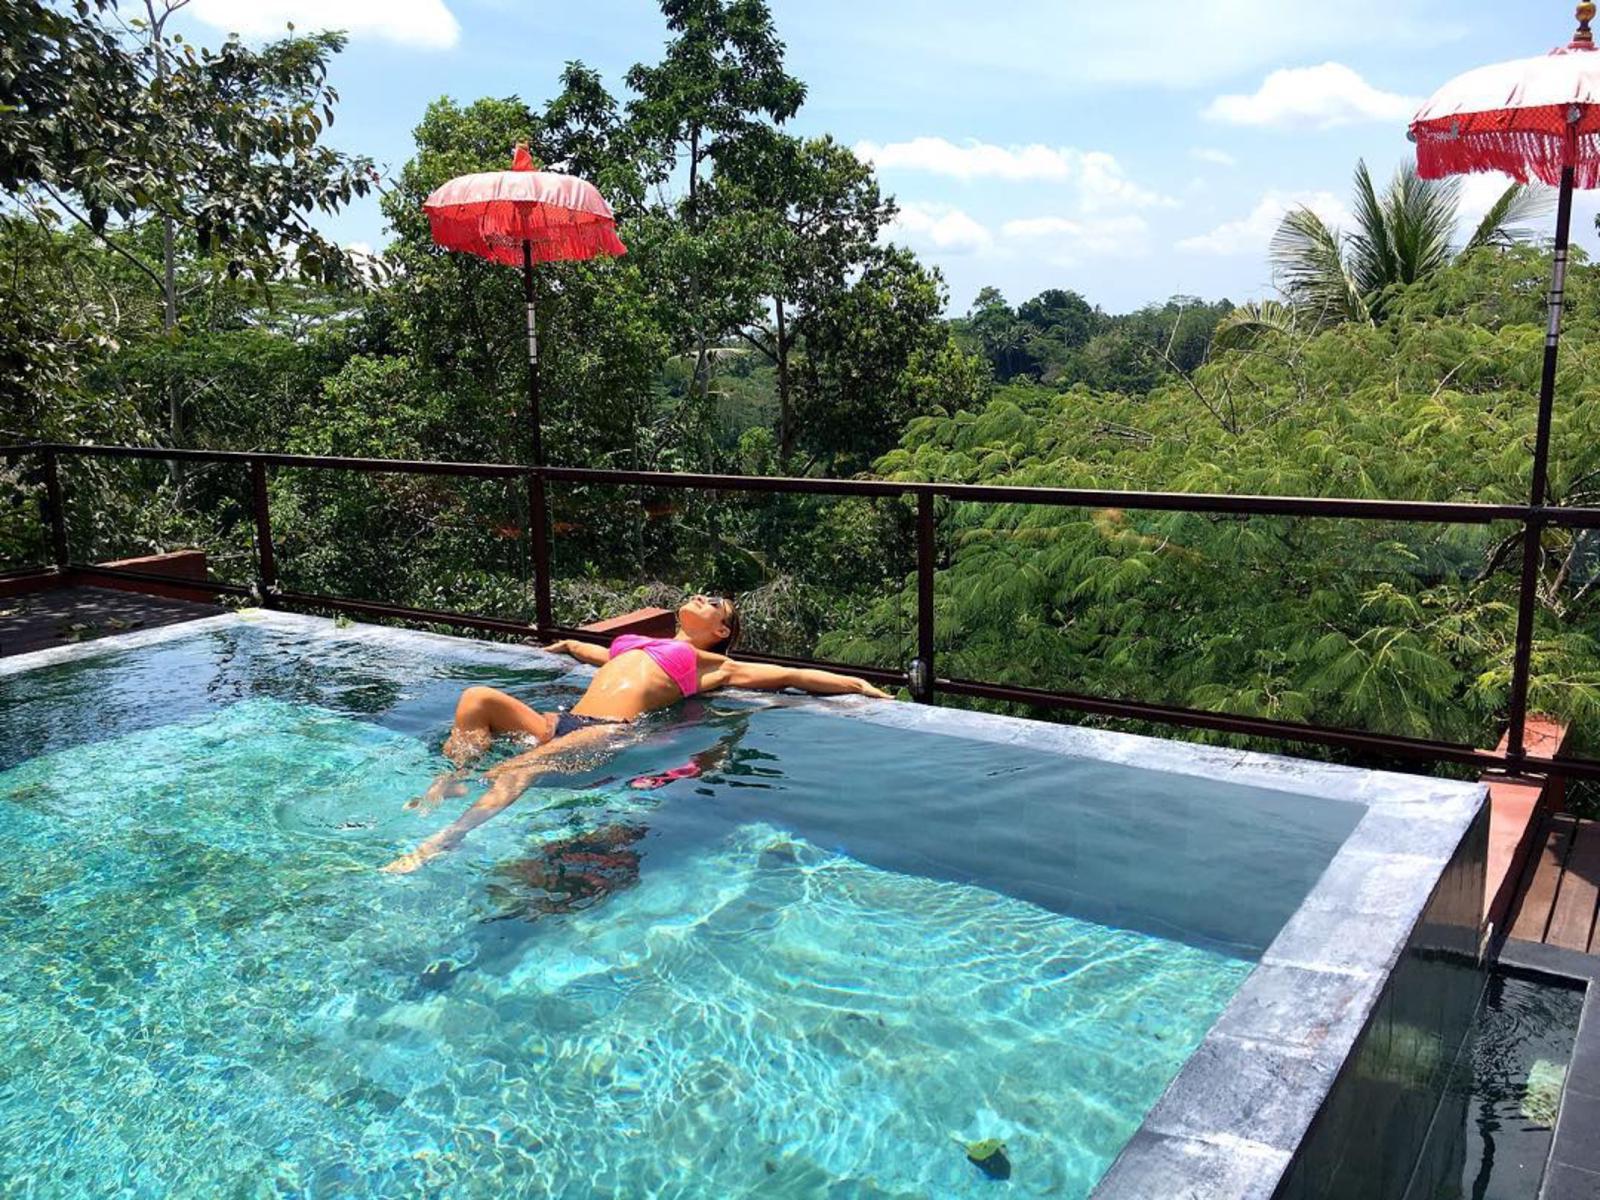 Nicoleta Nuca vacant poza costum d baie piscina interviu